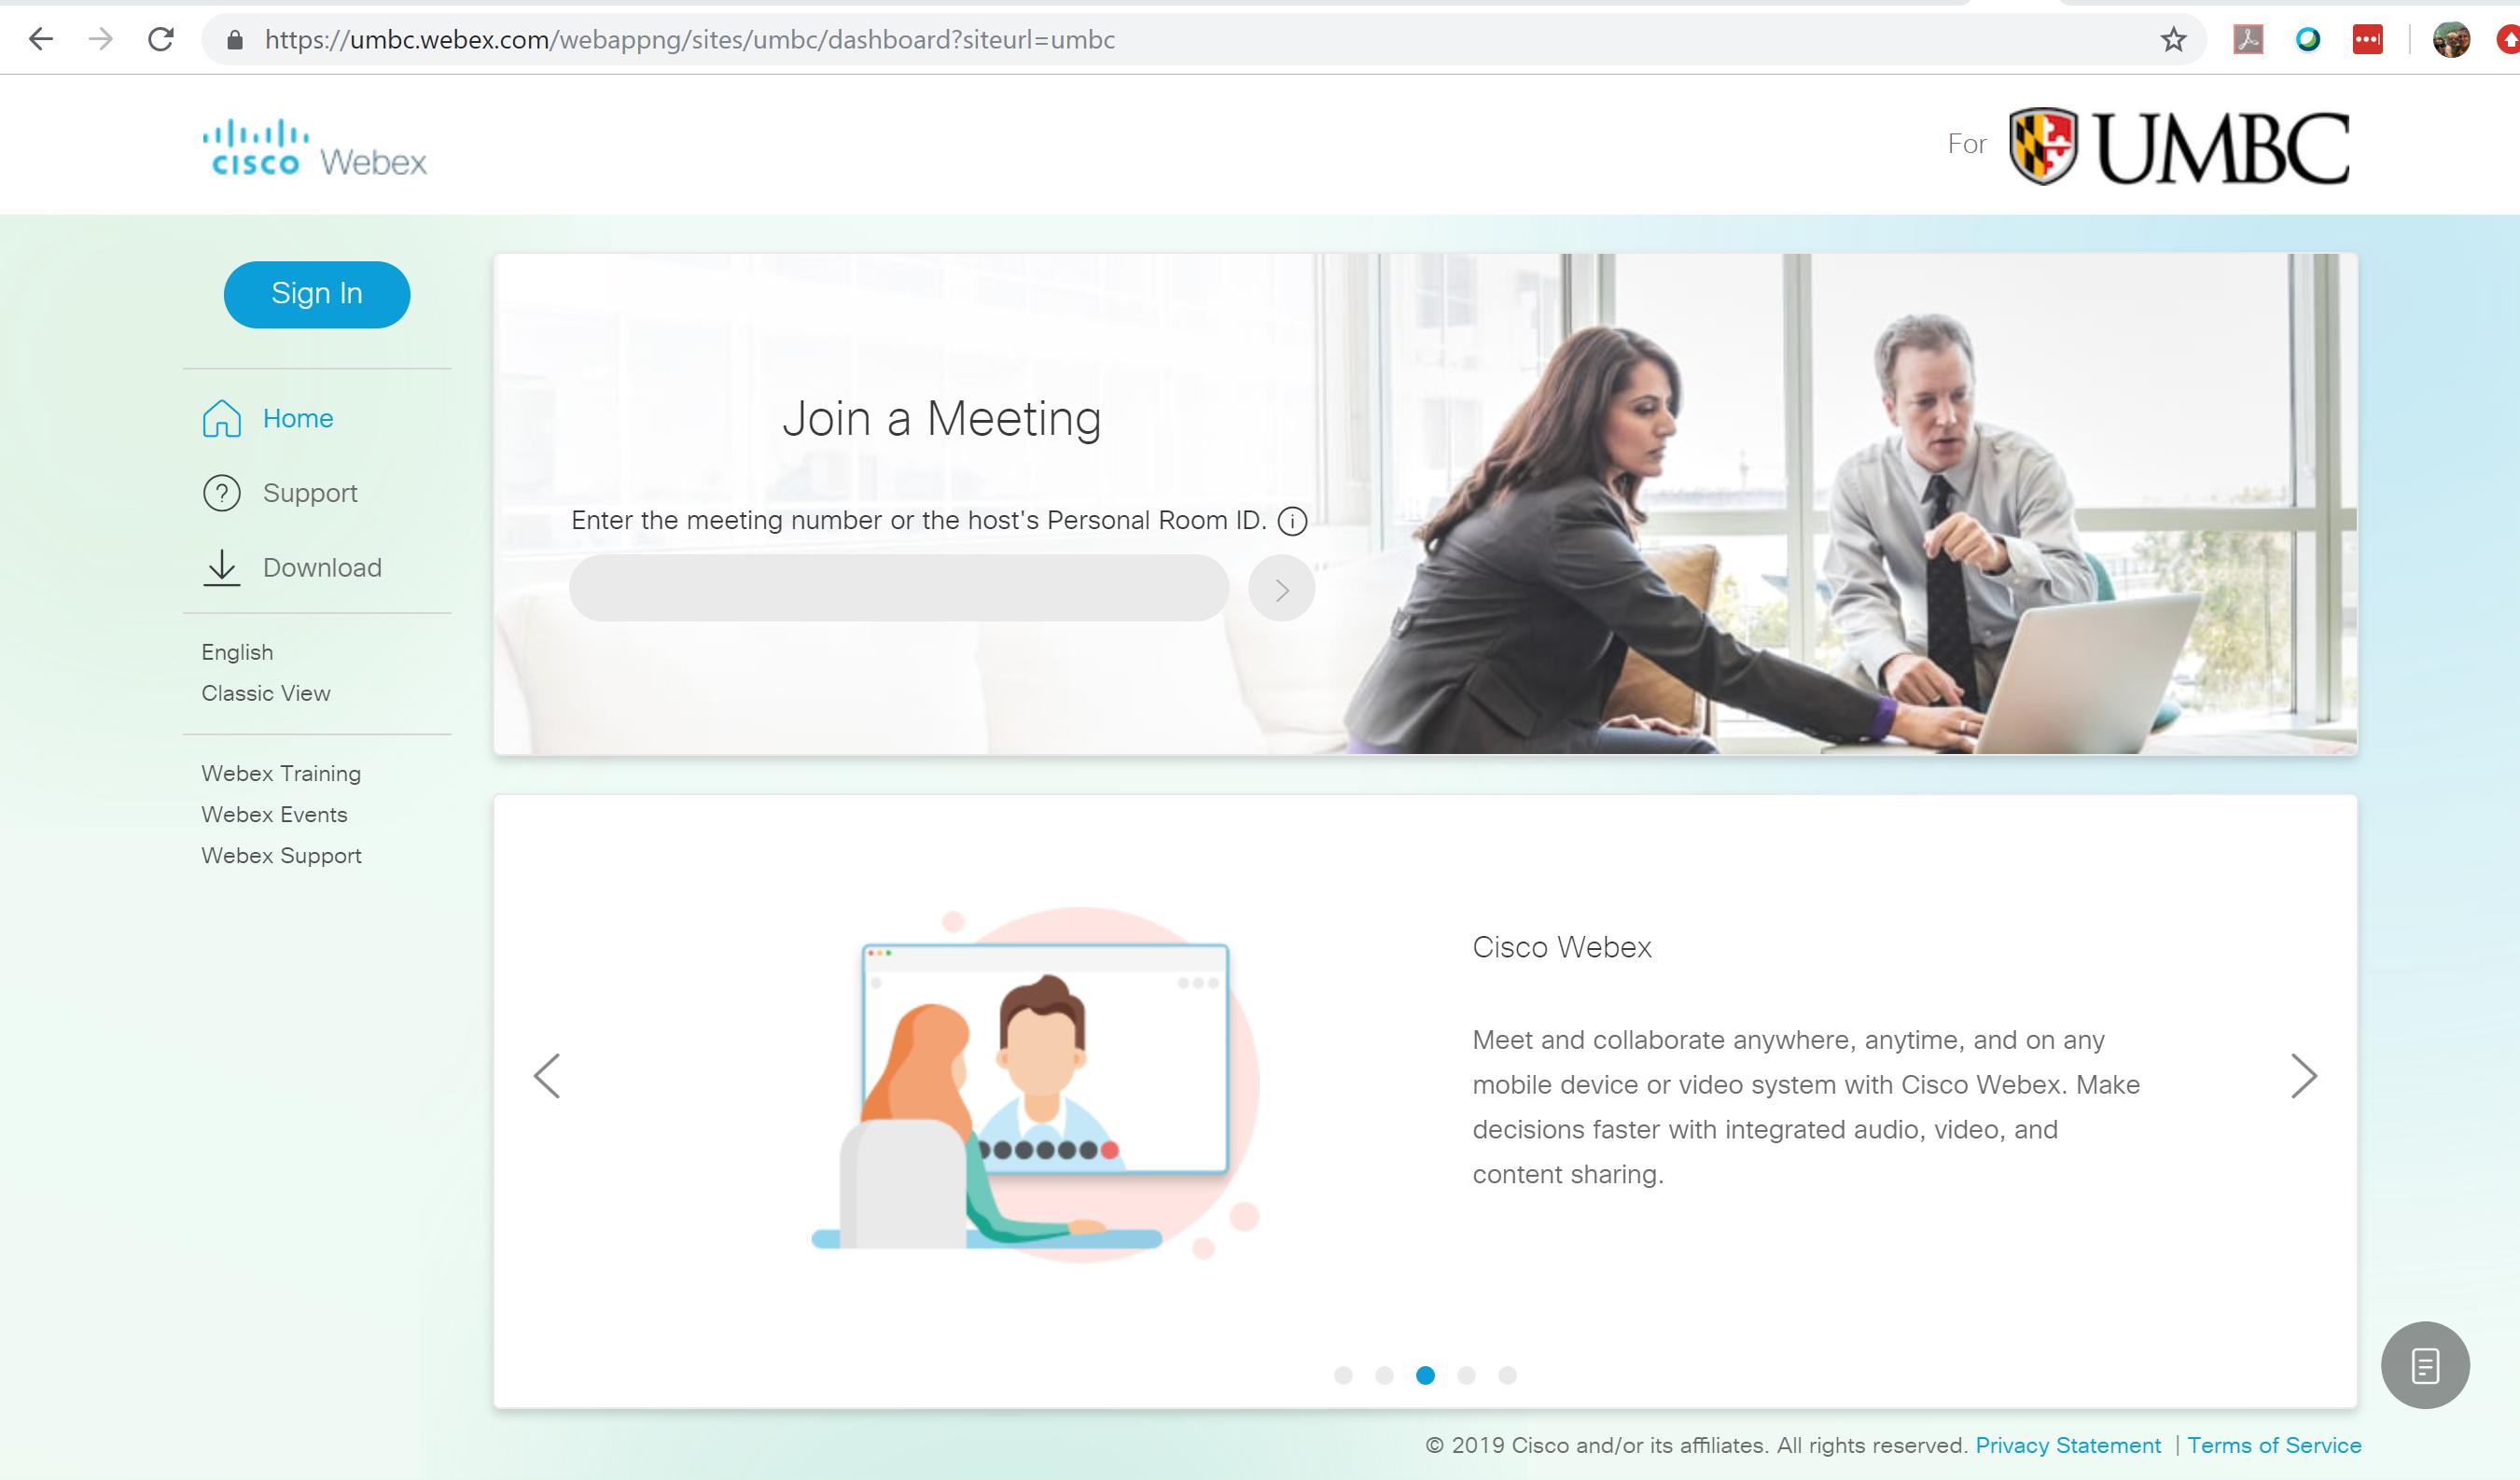 Convert my Existing Webex Account - Find Help (FAQs) - UMBC